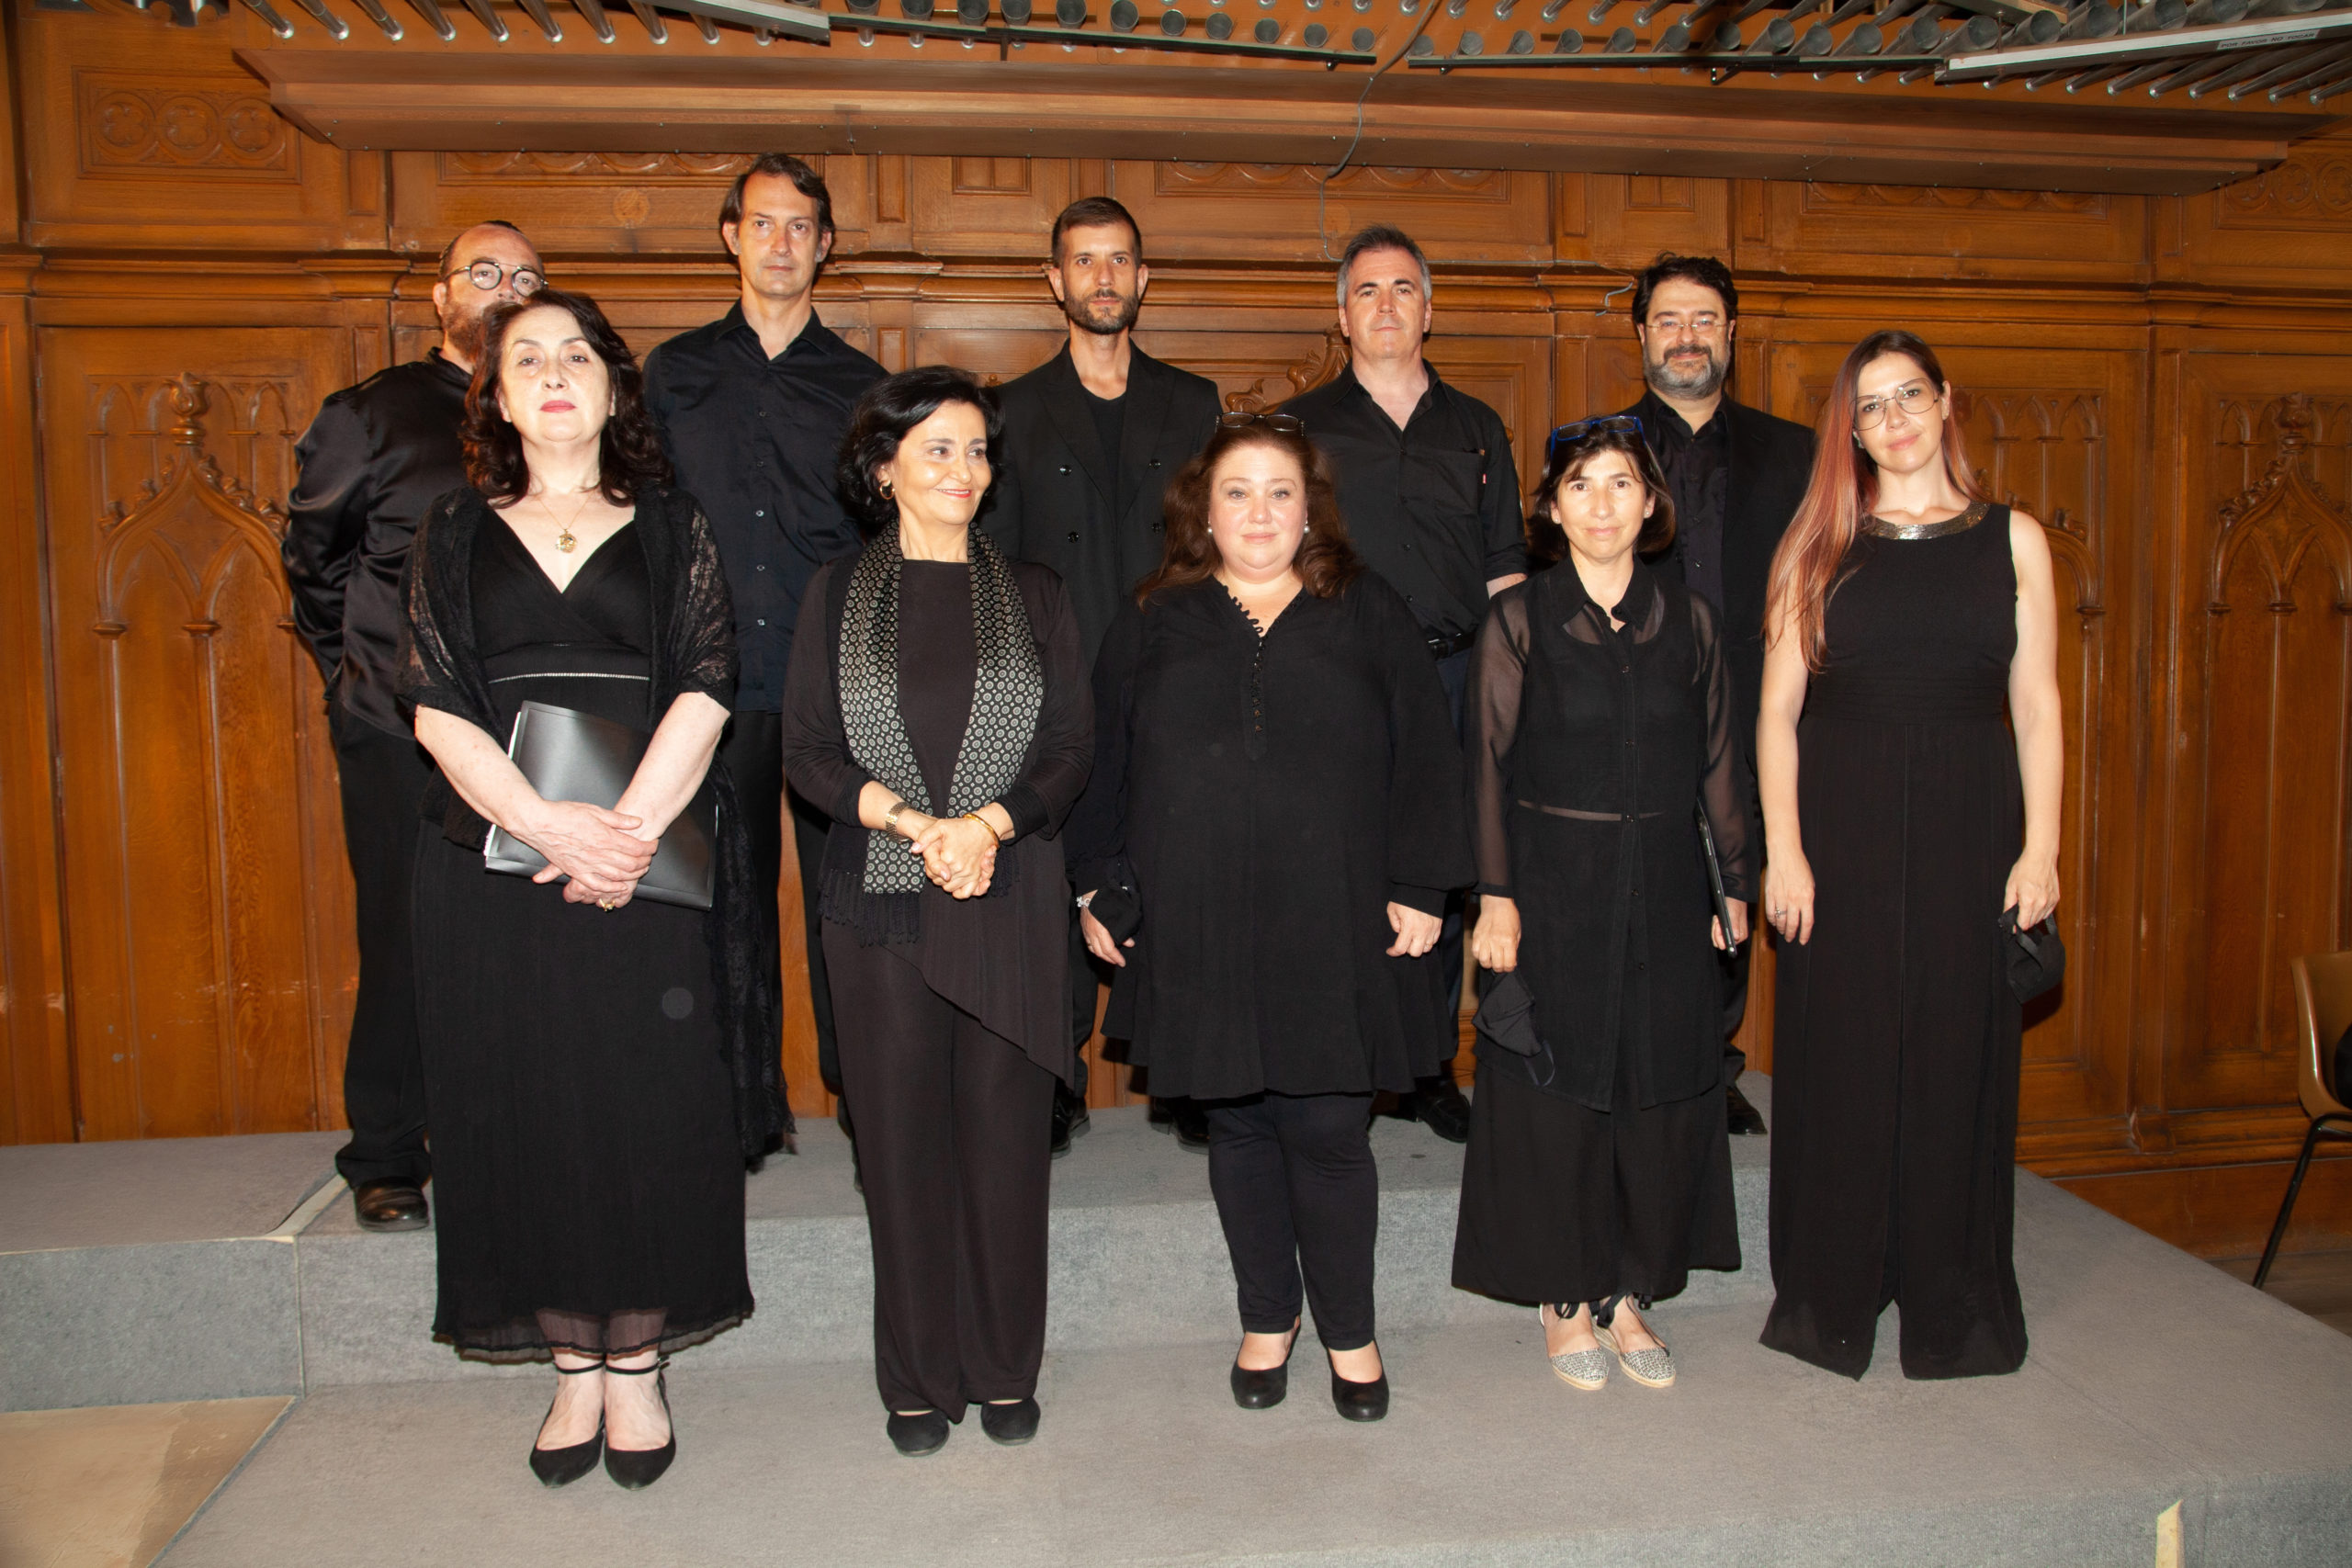 Grupo musical para funerales En Alas del Canto